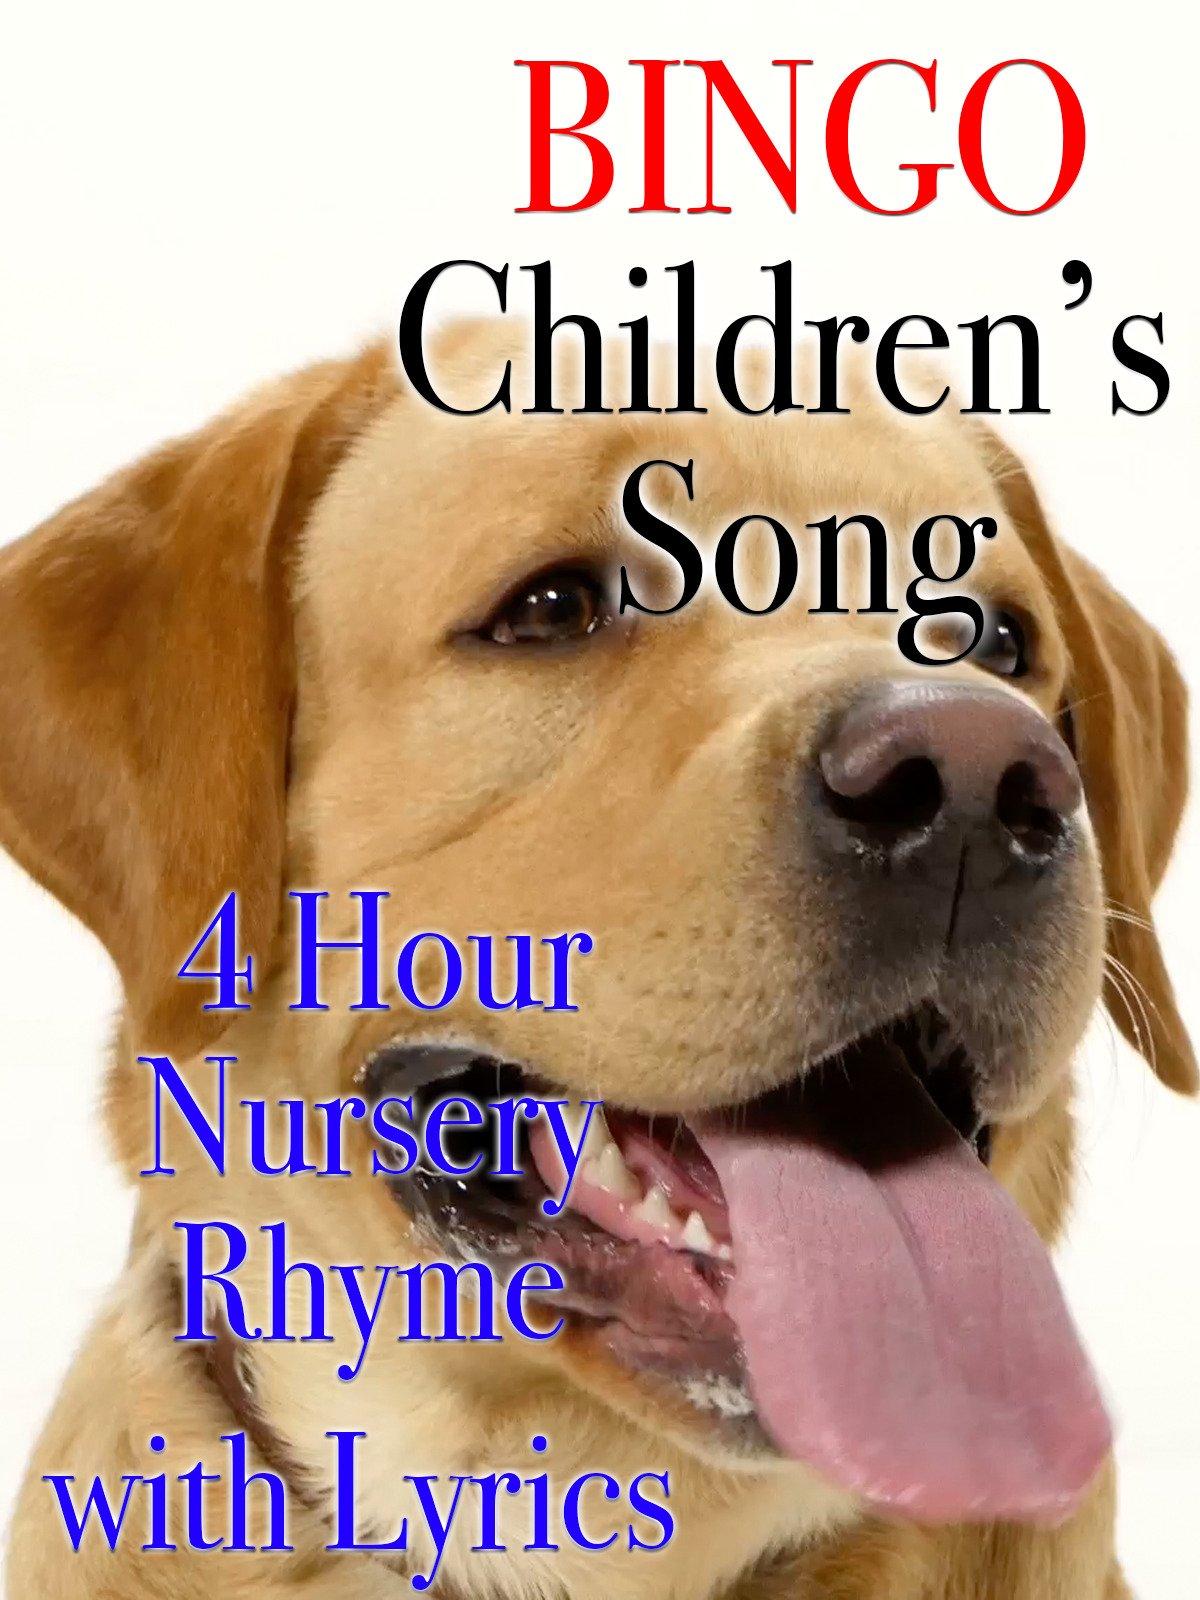 Bingo Children's Song 4 Hour Nursery Rhyme with Lyrics